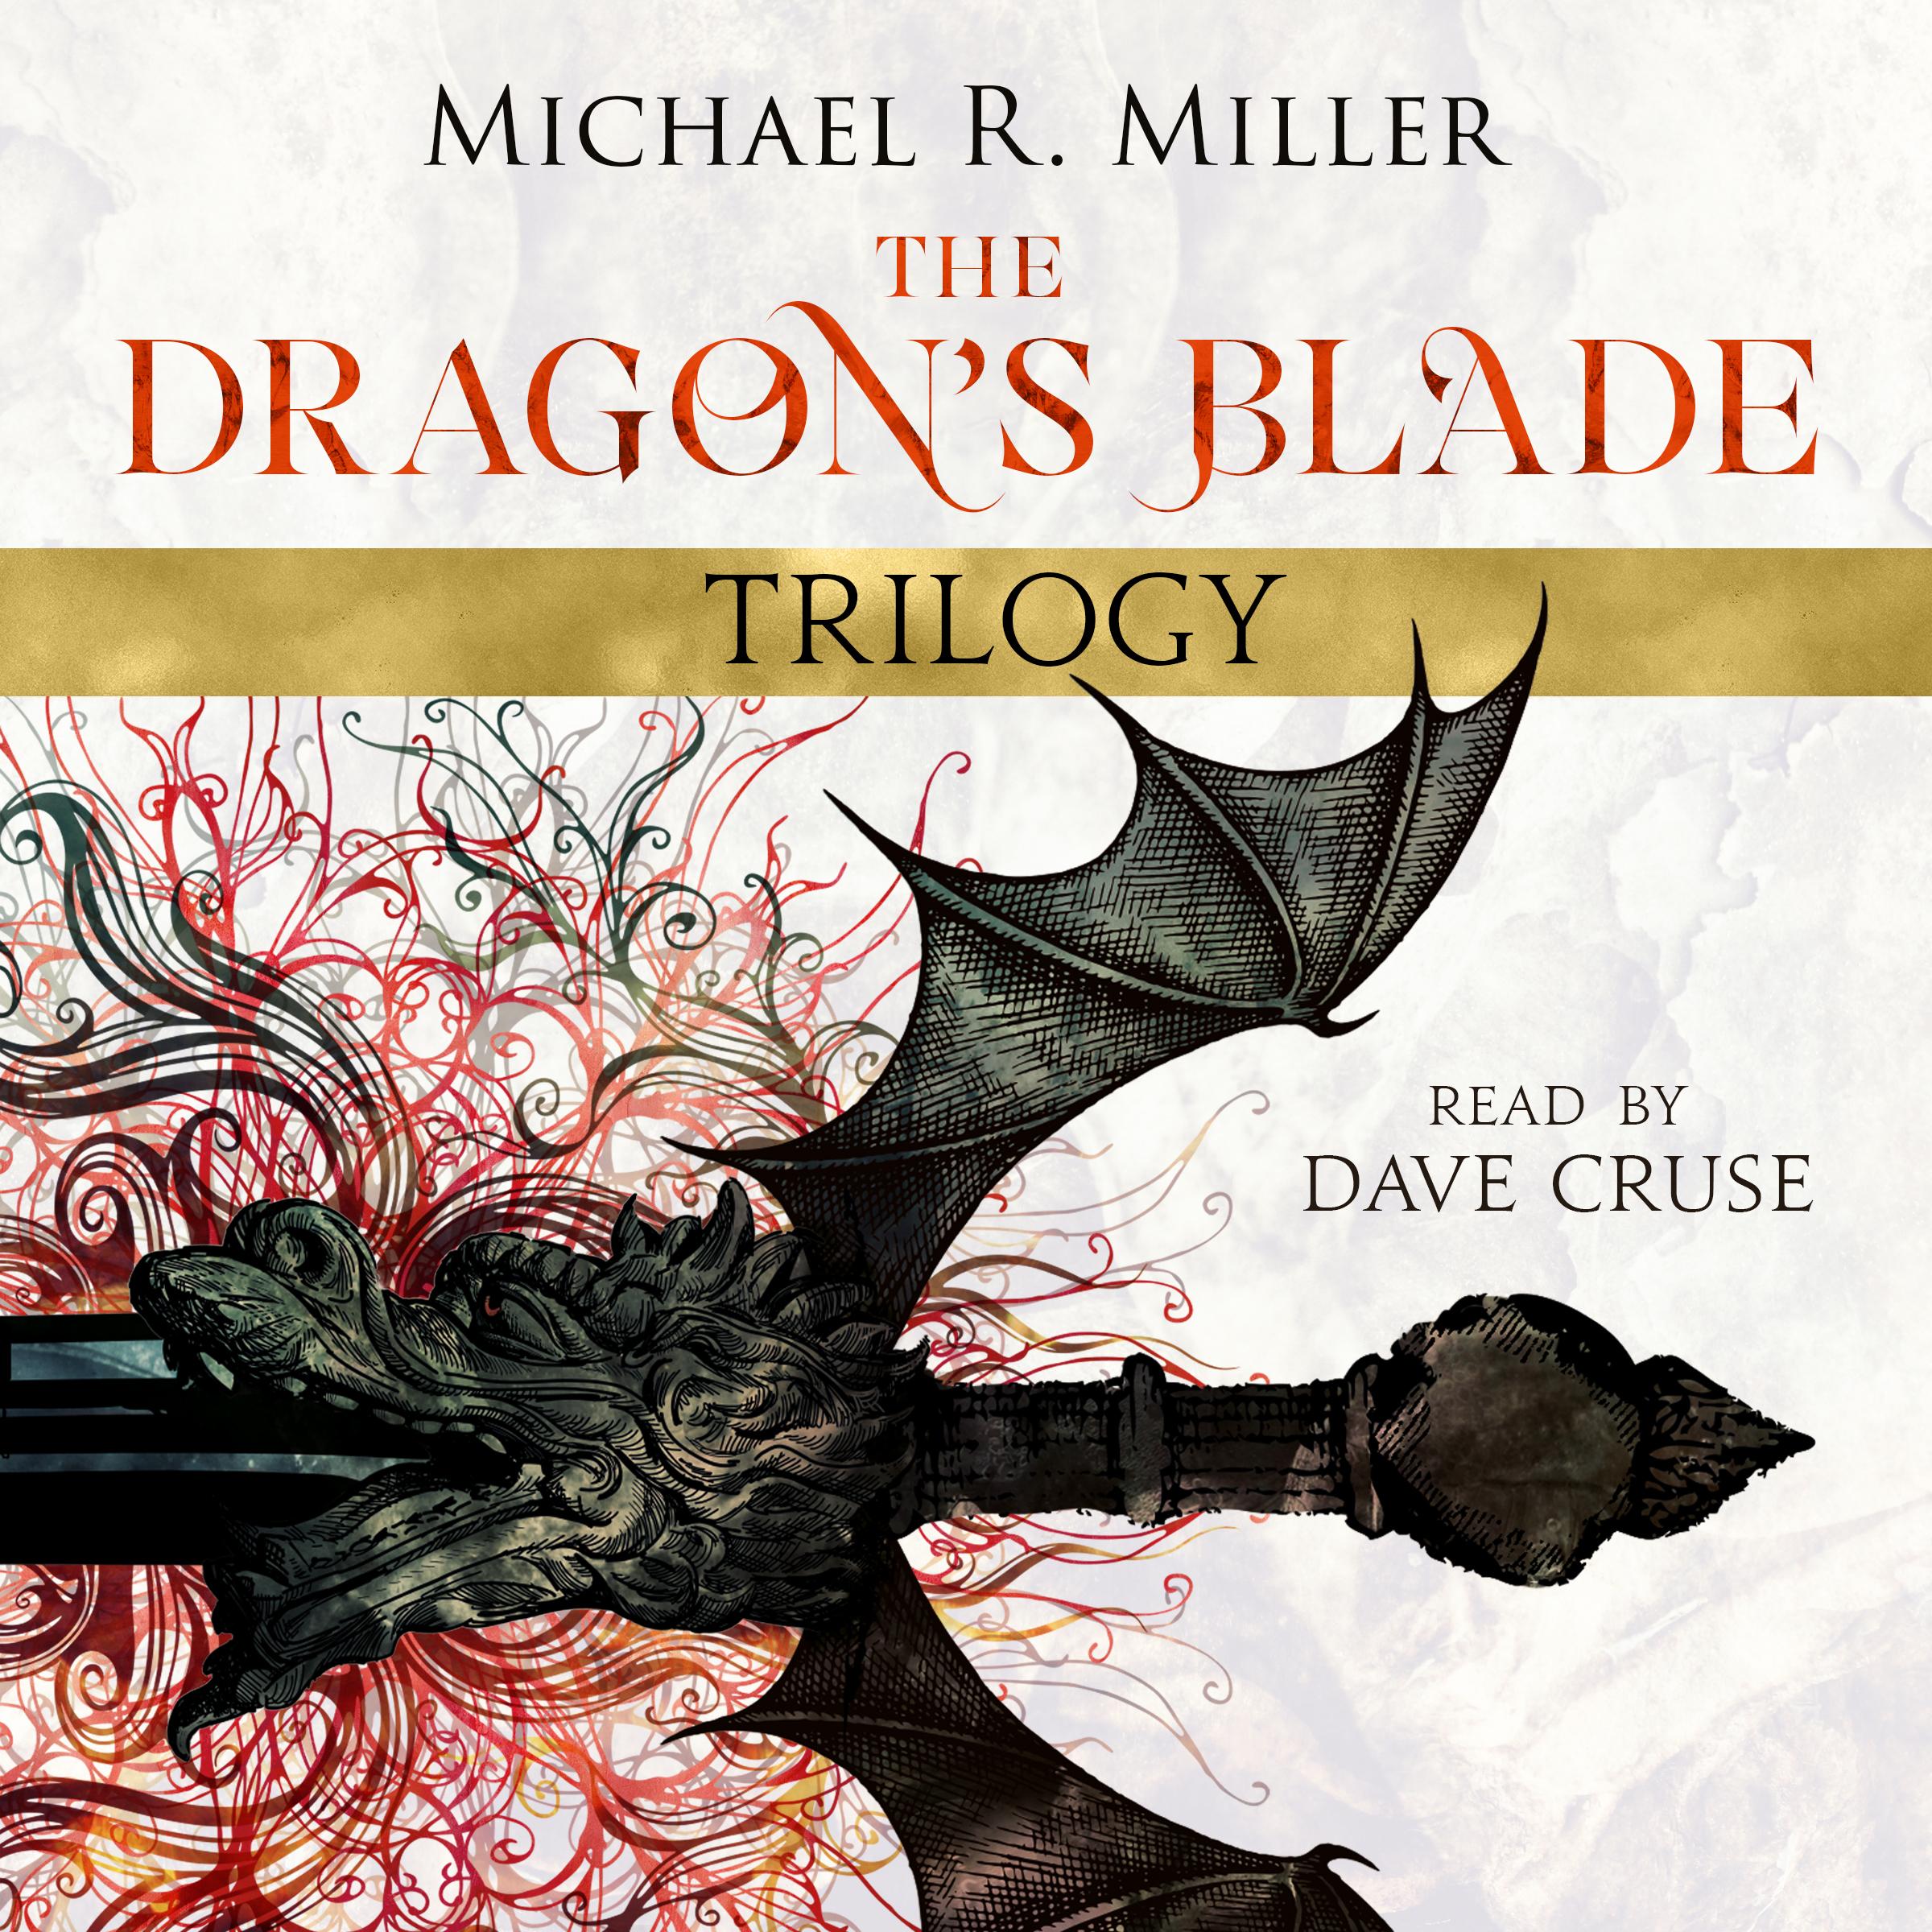 DRAGON'S BLADE TRILOGY AUDIO COVER.jpg